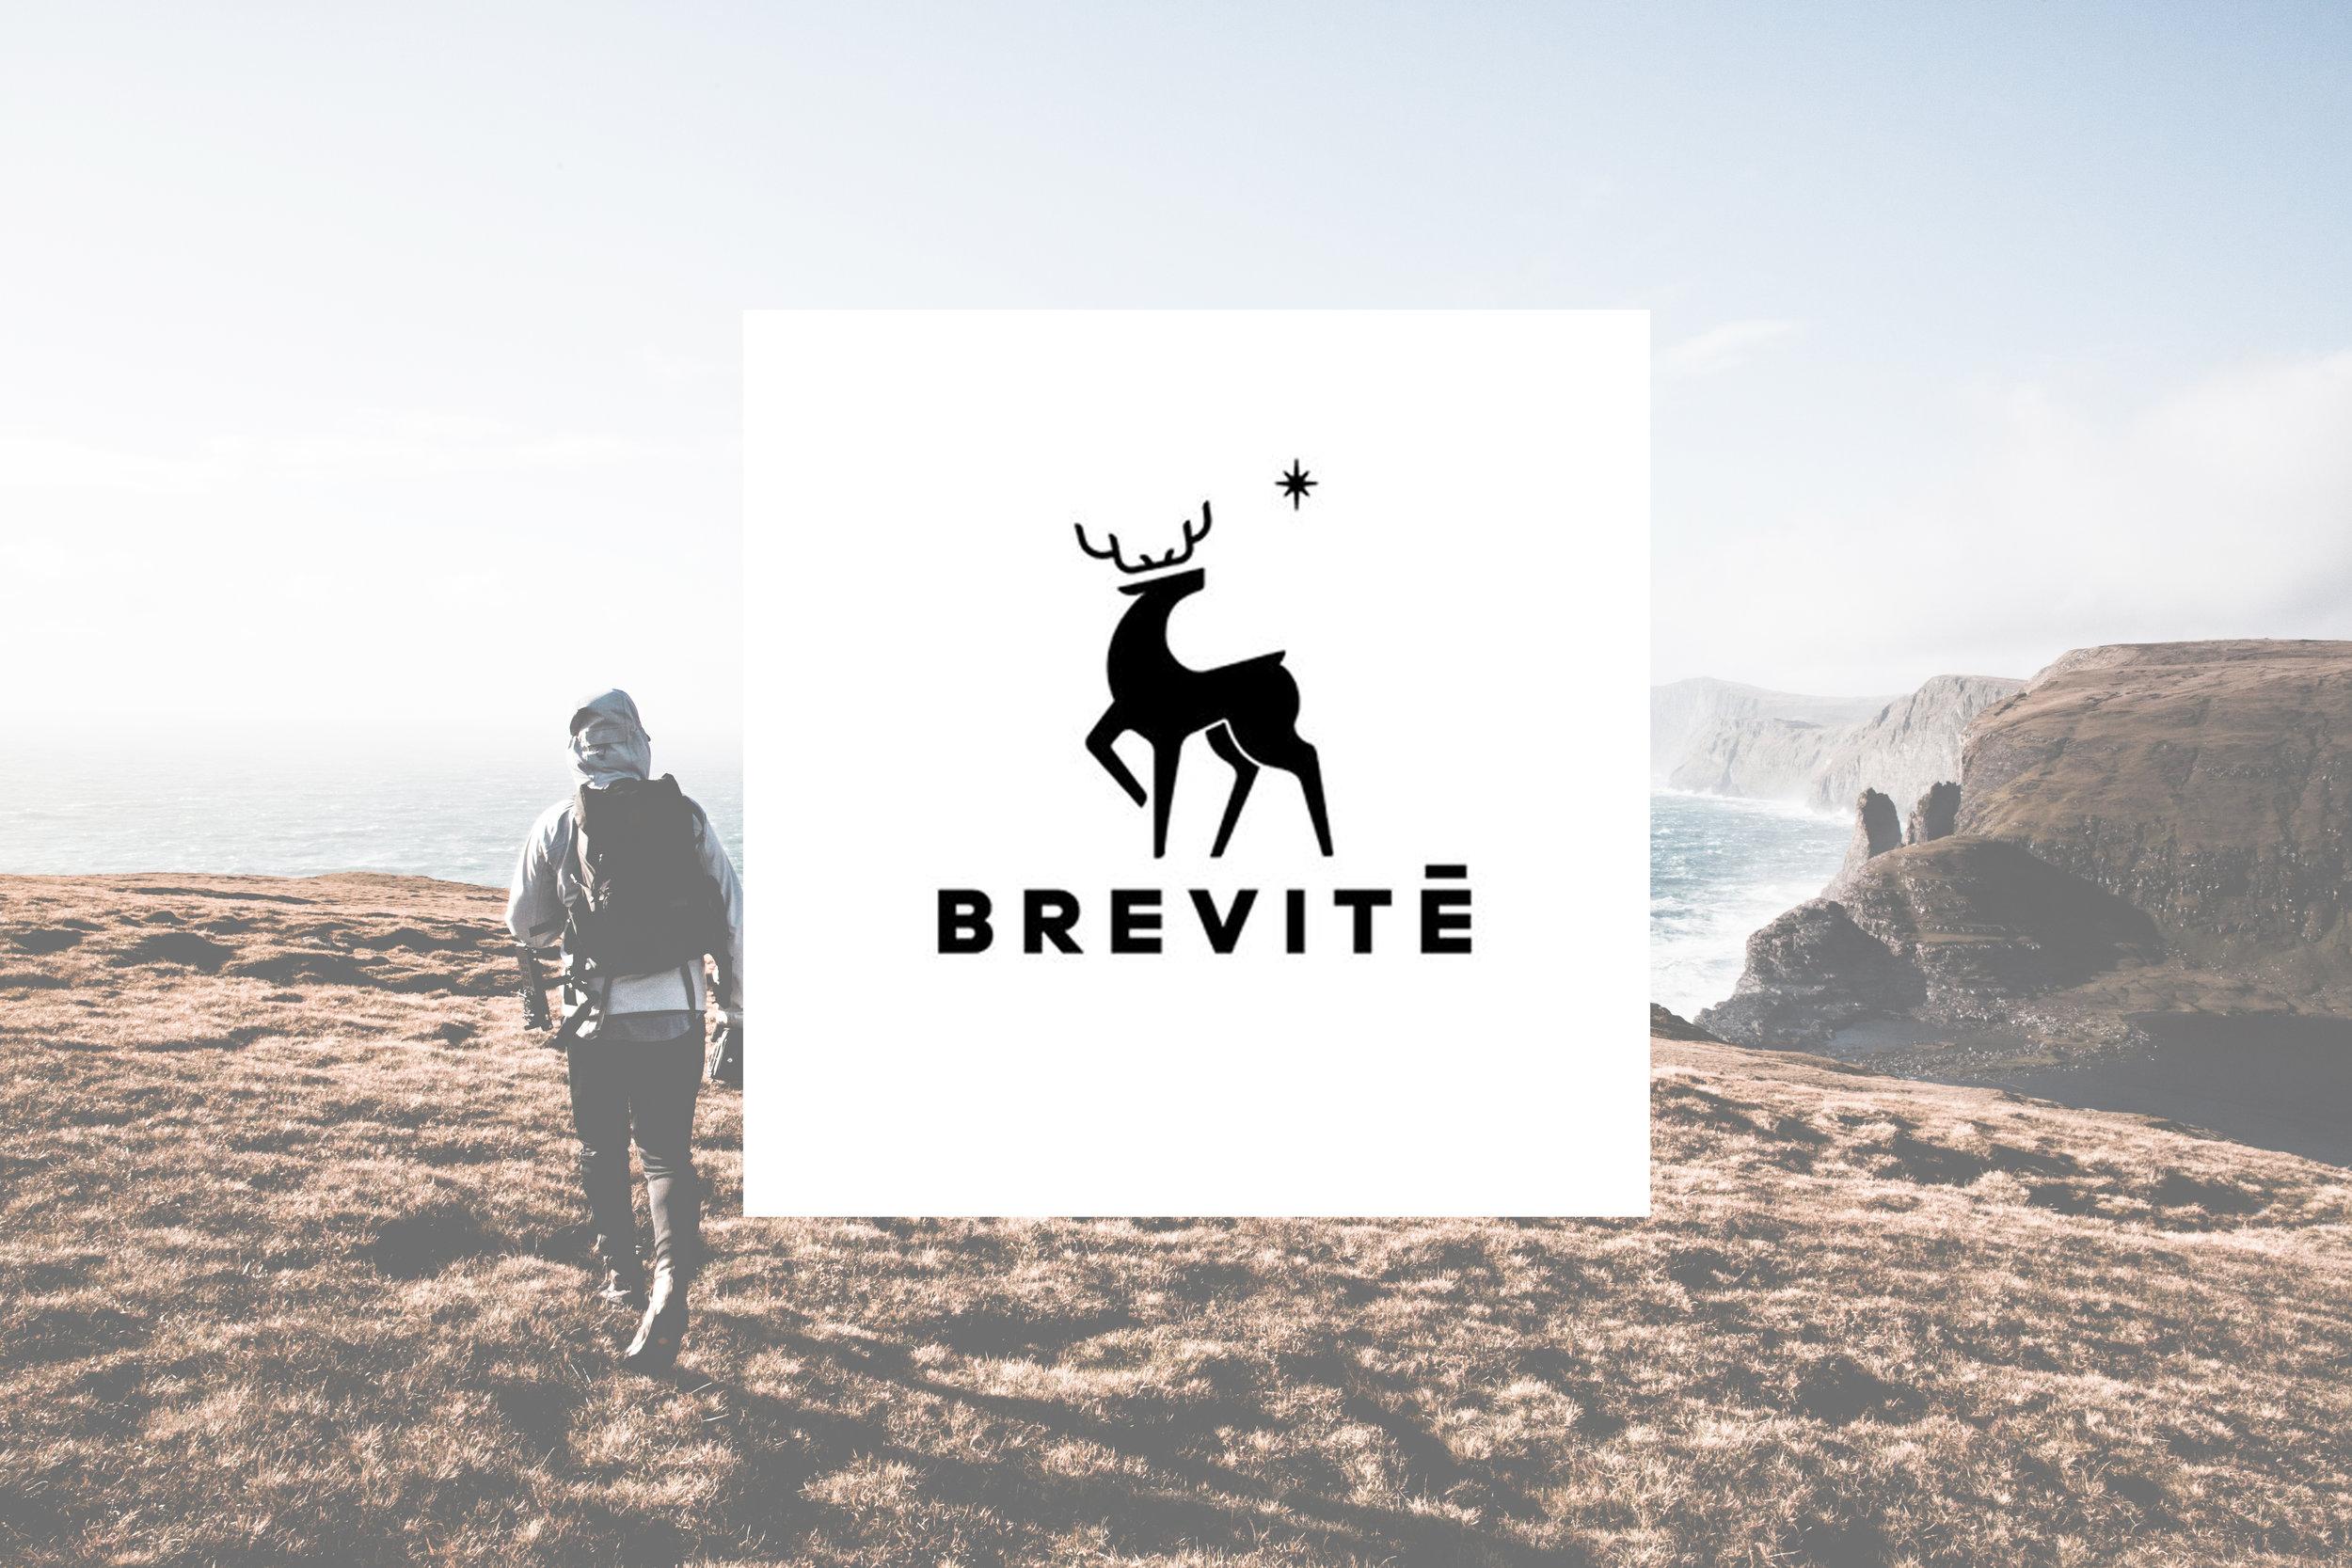 Brevité - Product deployment content for company's website